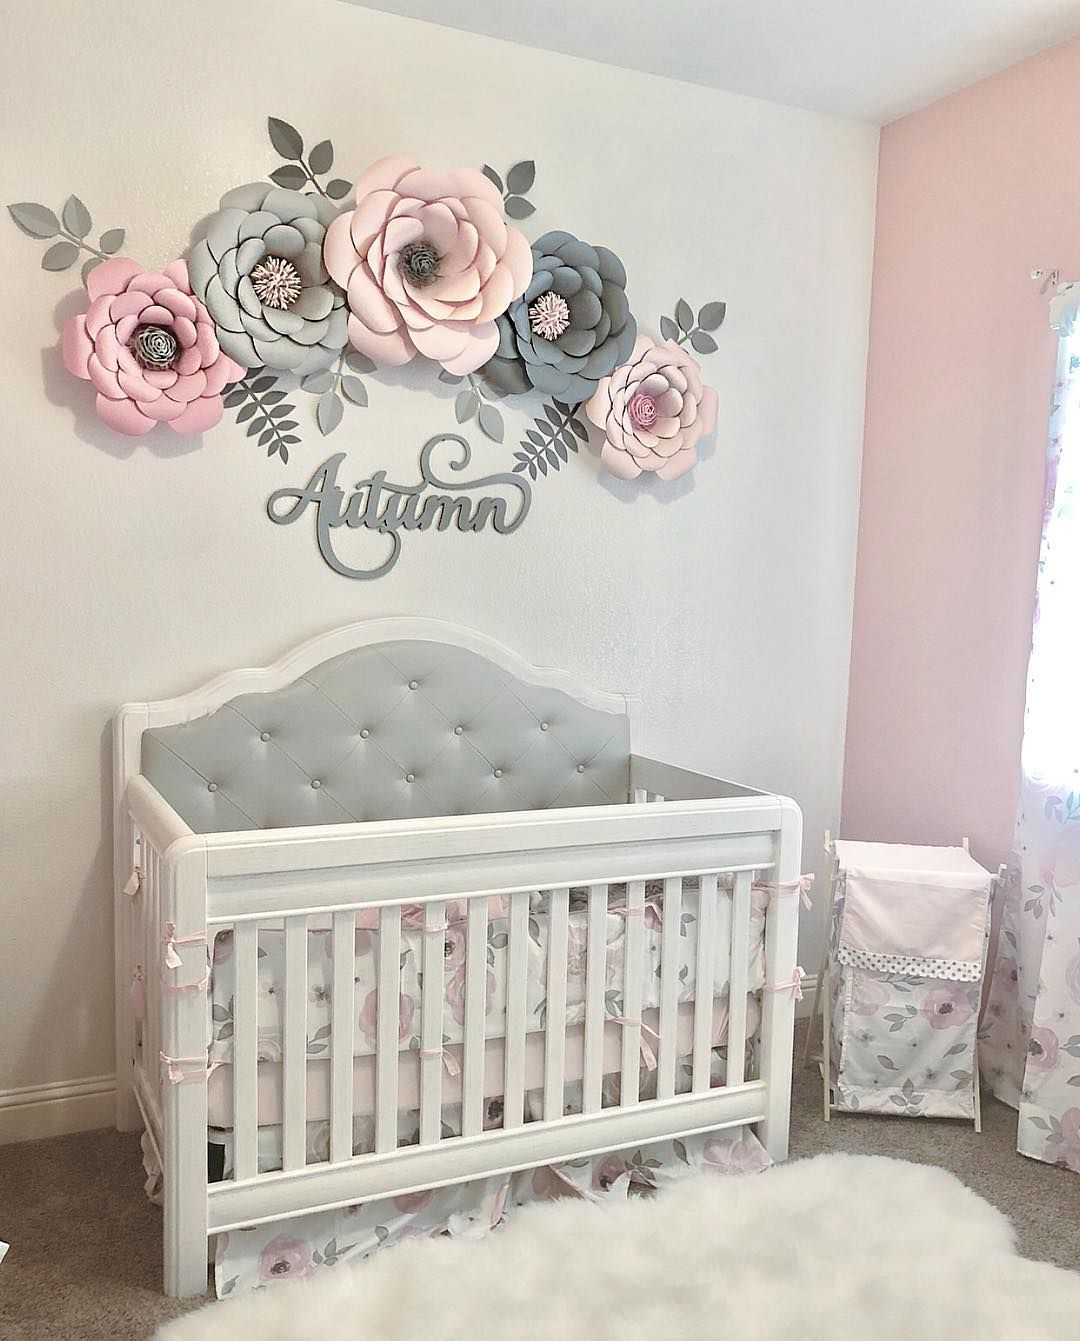 Trendy 14 Ikea Home Decor Instagram Baby Nursery Decor Cool Furniture Girl Nursery Room